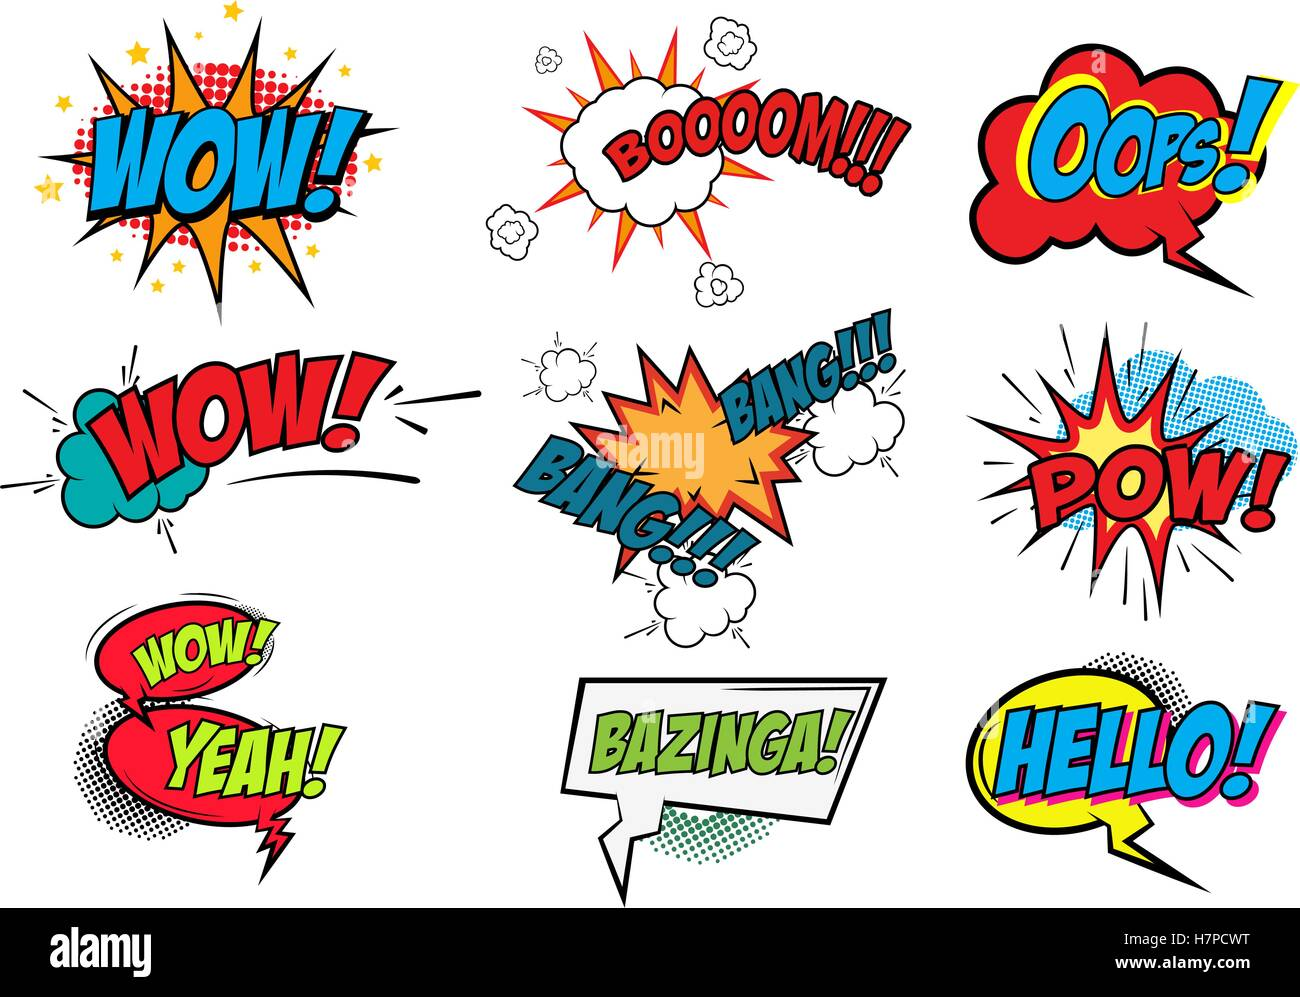 Set of Comic Text, Pop Art style - Stock Image